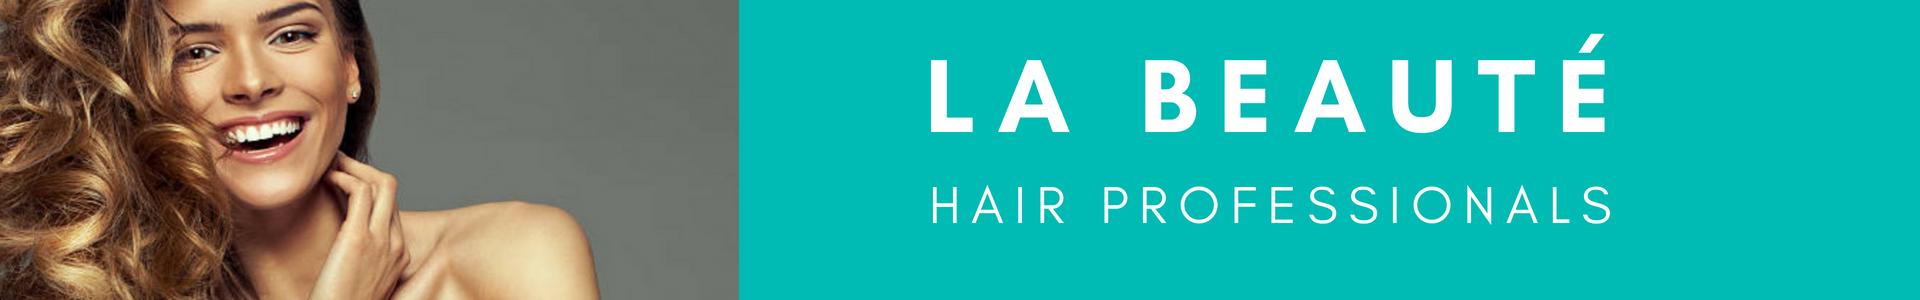 la beaute hair professionals keratine pure et argan